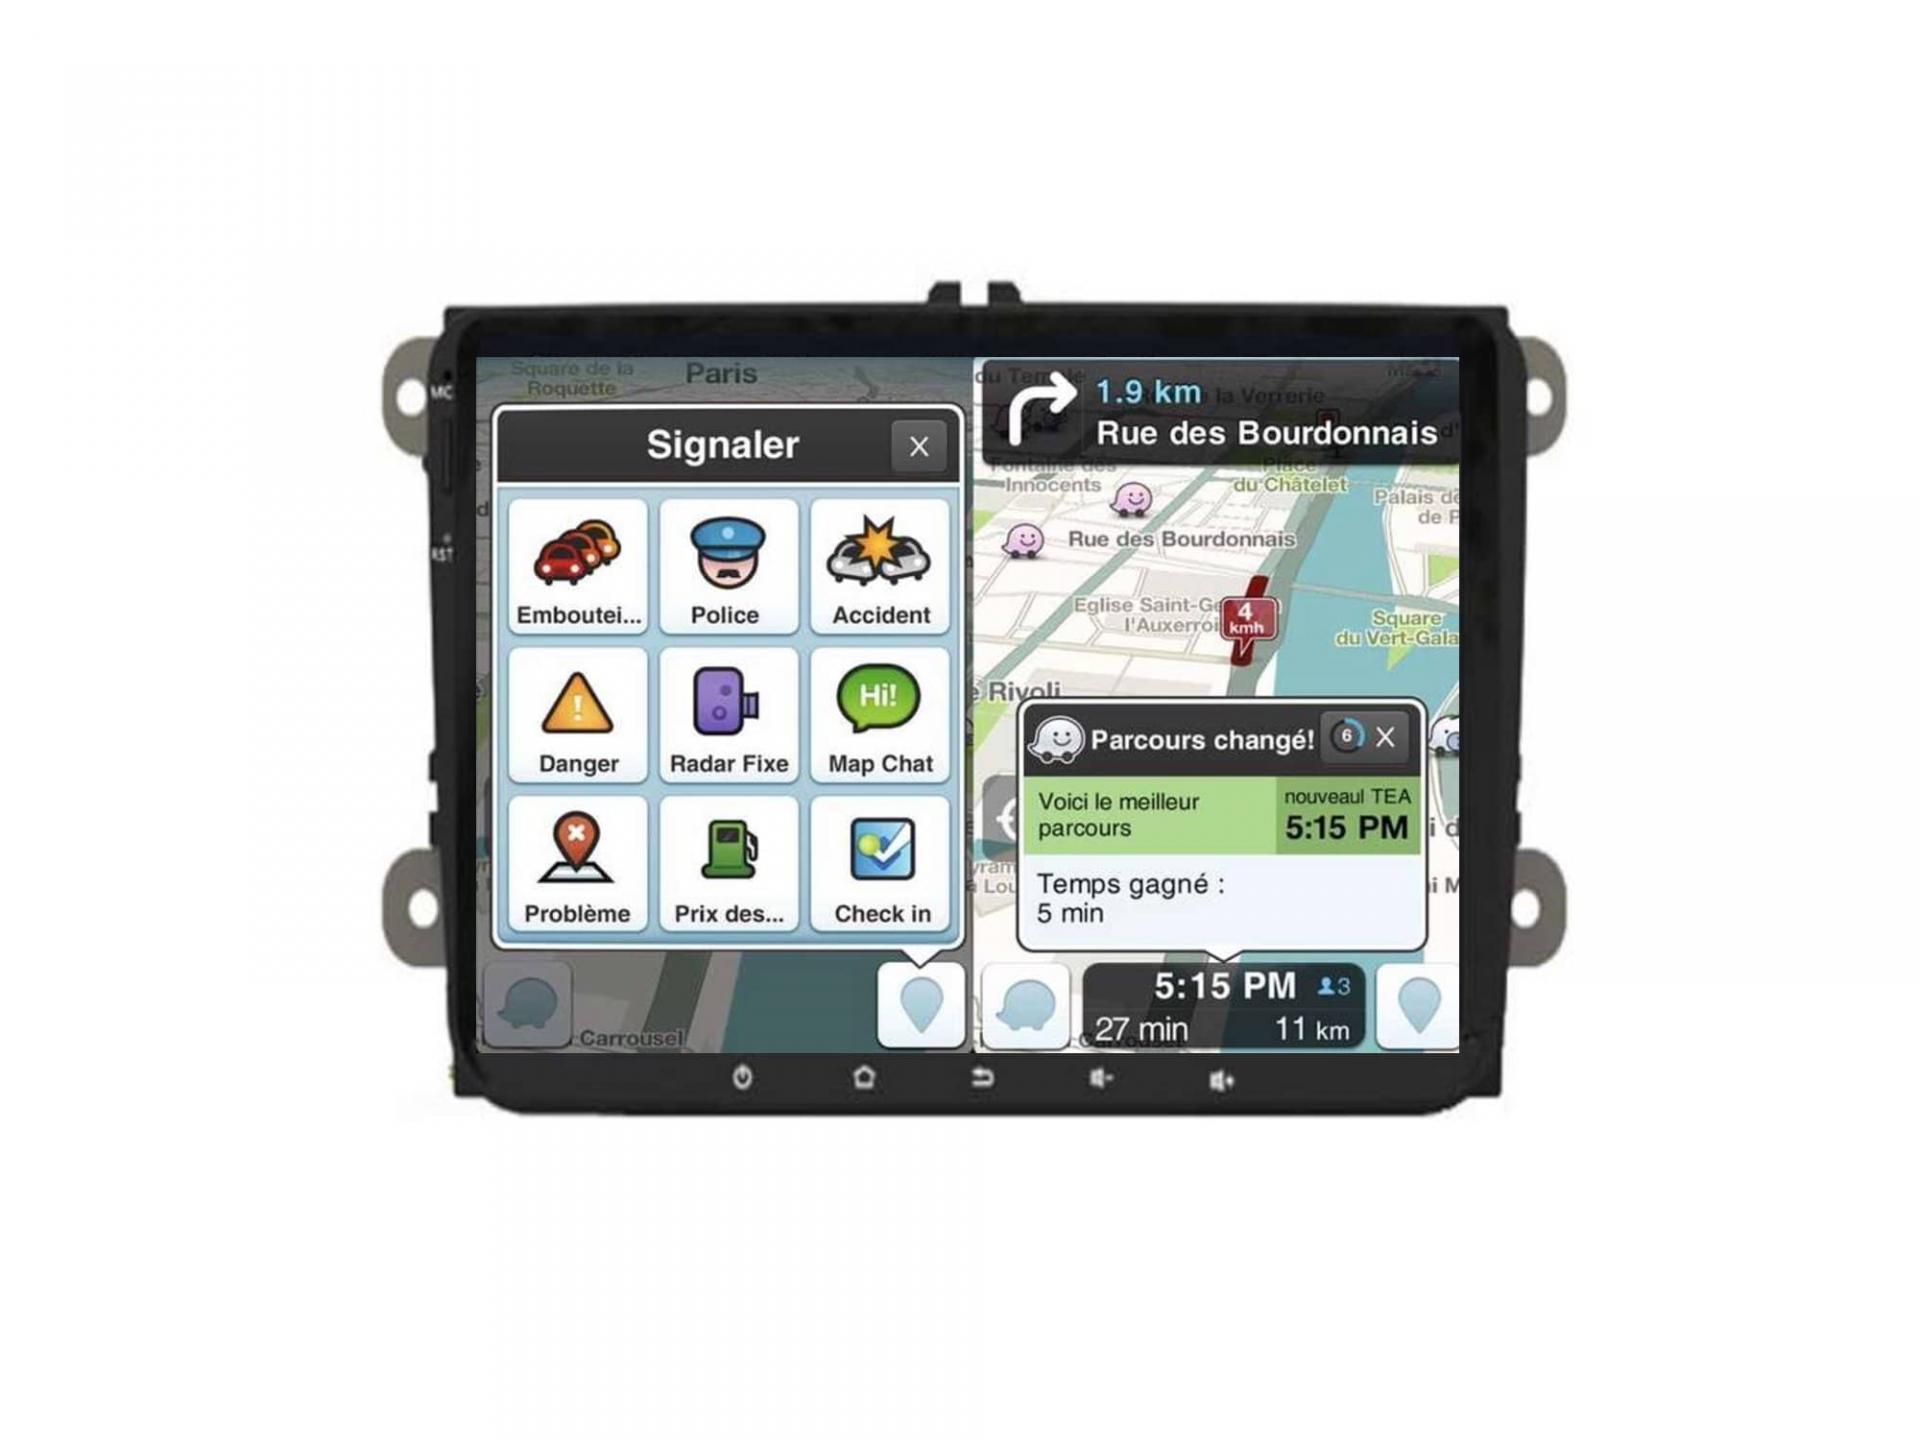 Autoradio gps carplay android auto bluetooth vw golf 5 6 touran tiguan passat transporter t5 t6 polo scirocco beetle eos 6